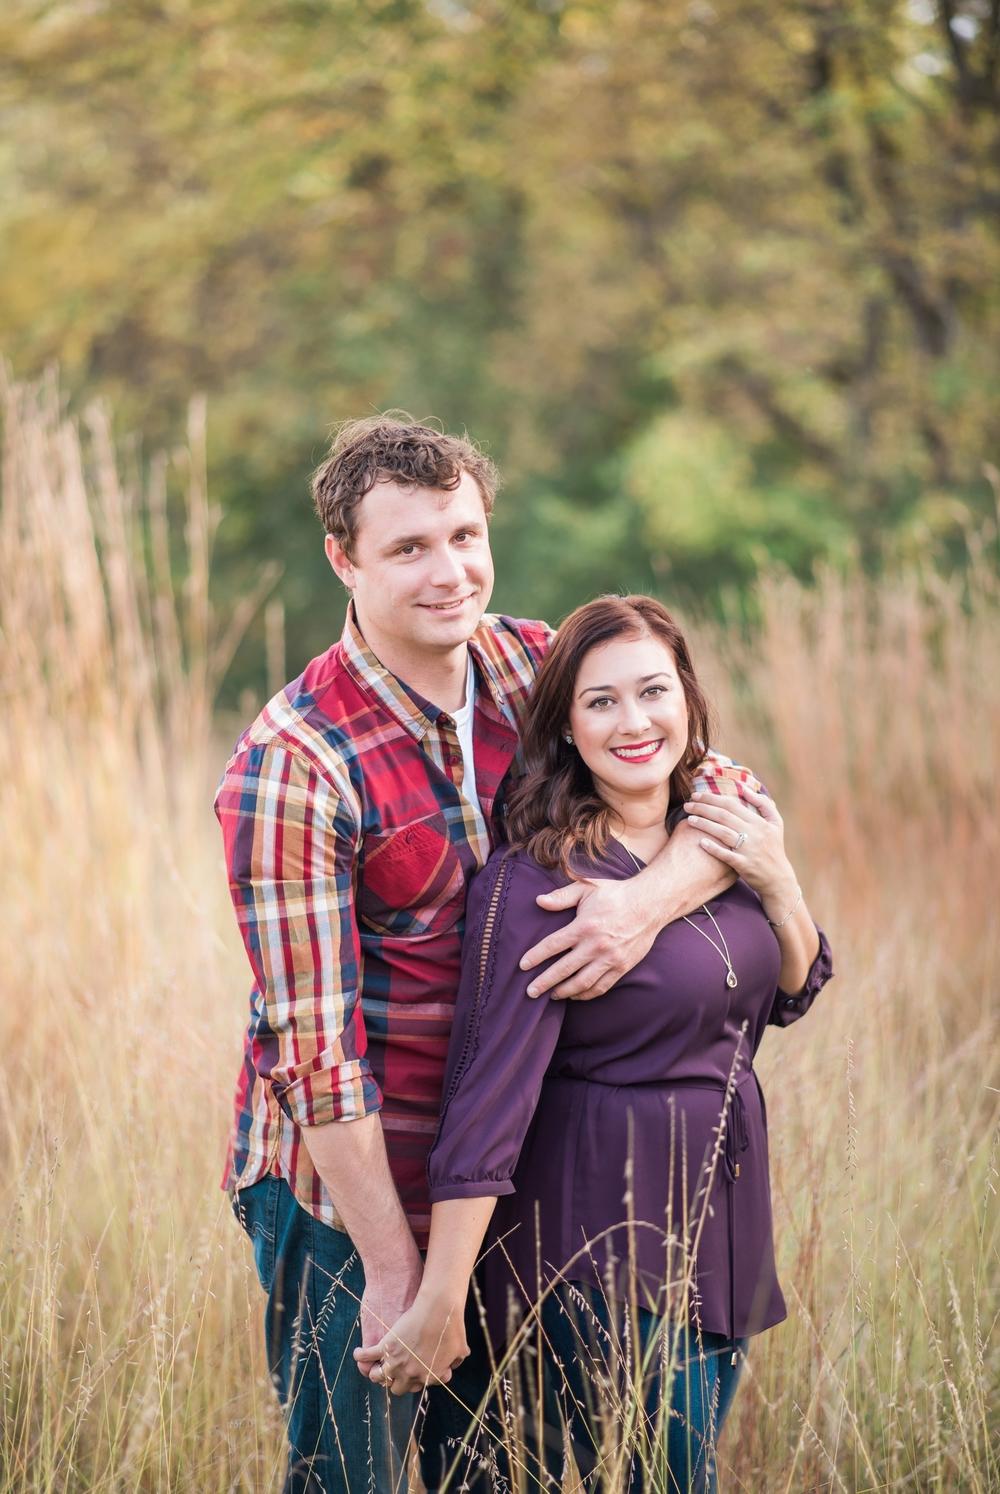 Megan & James Esession 3.jpg